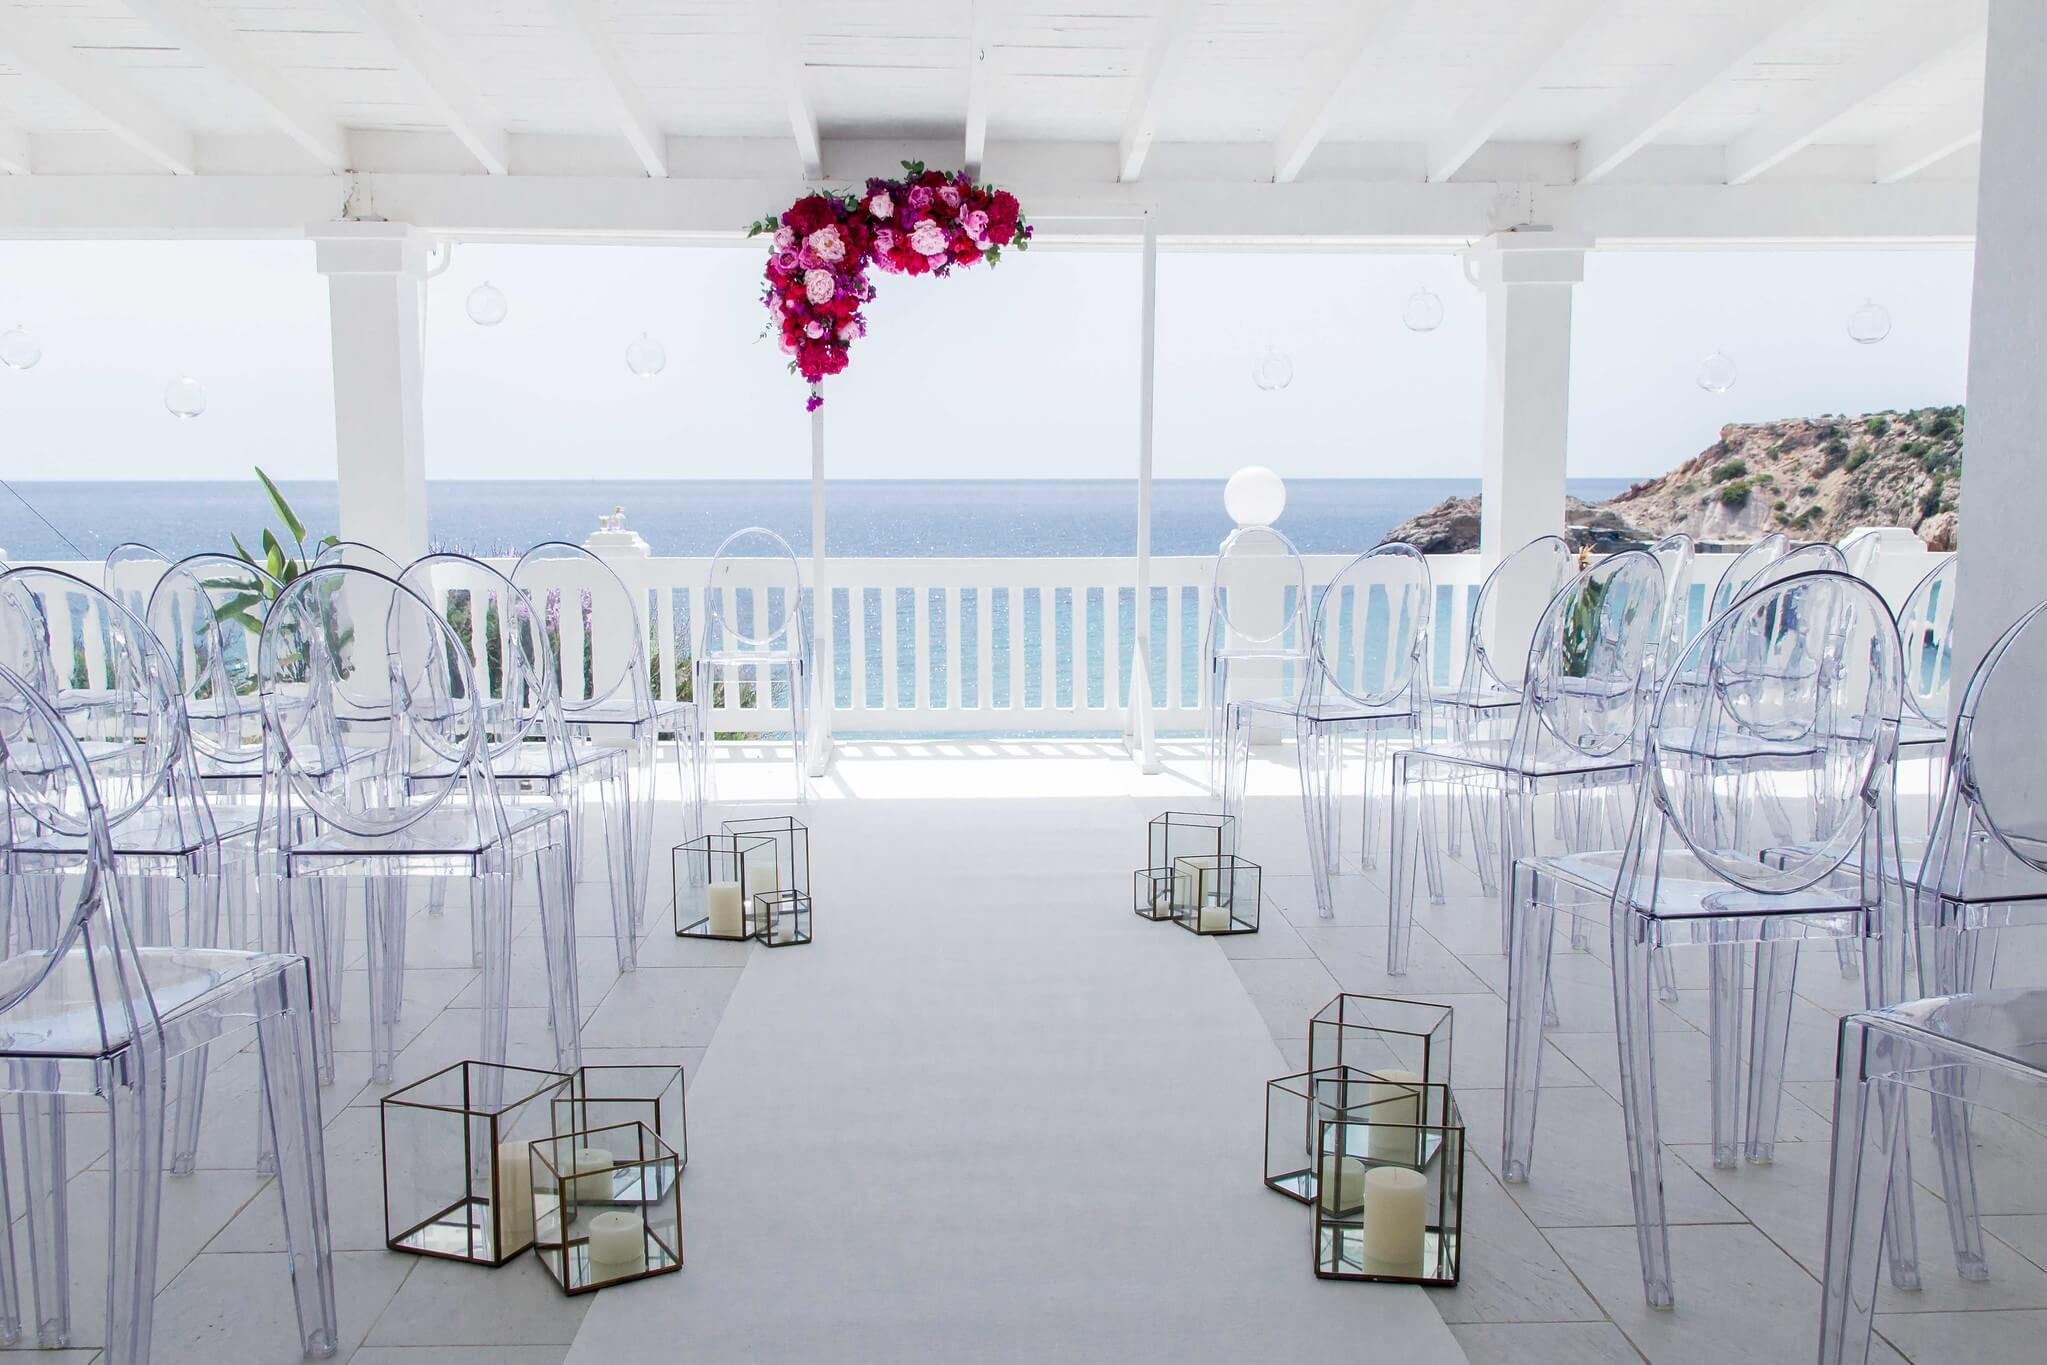 https://www.white-ibiza.com/wp-content/uploads/2020/03/ibiza-wedding-venues-cotton-beach-2020-01.jpg